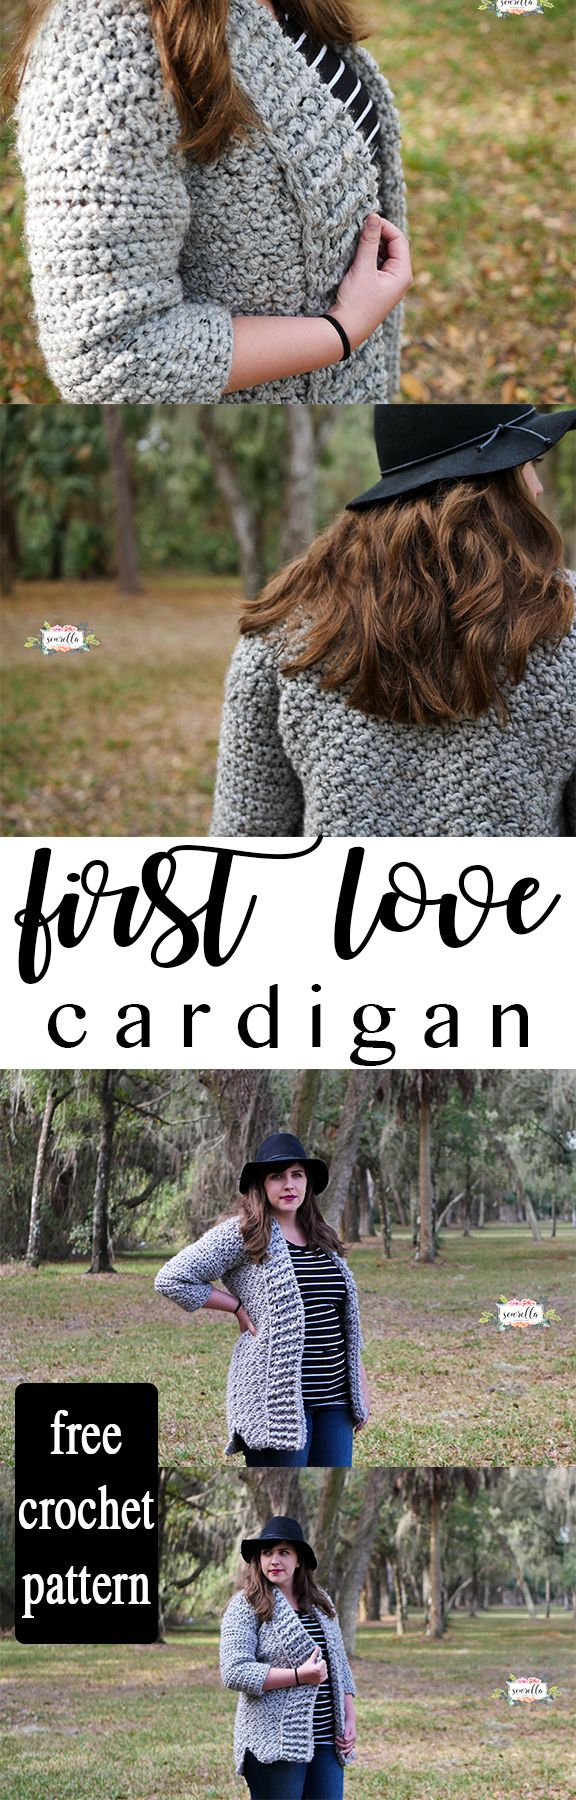 9fbeaa1f5fc First Love Crochet Cardigan